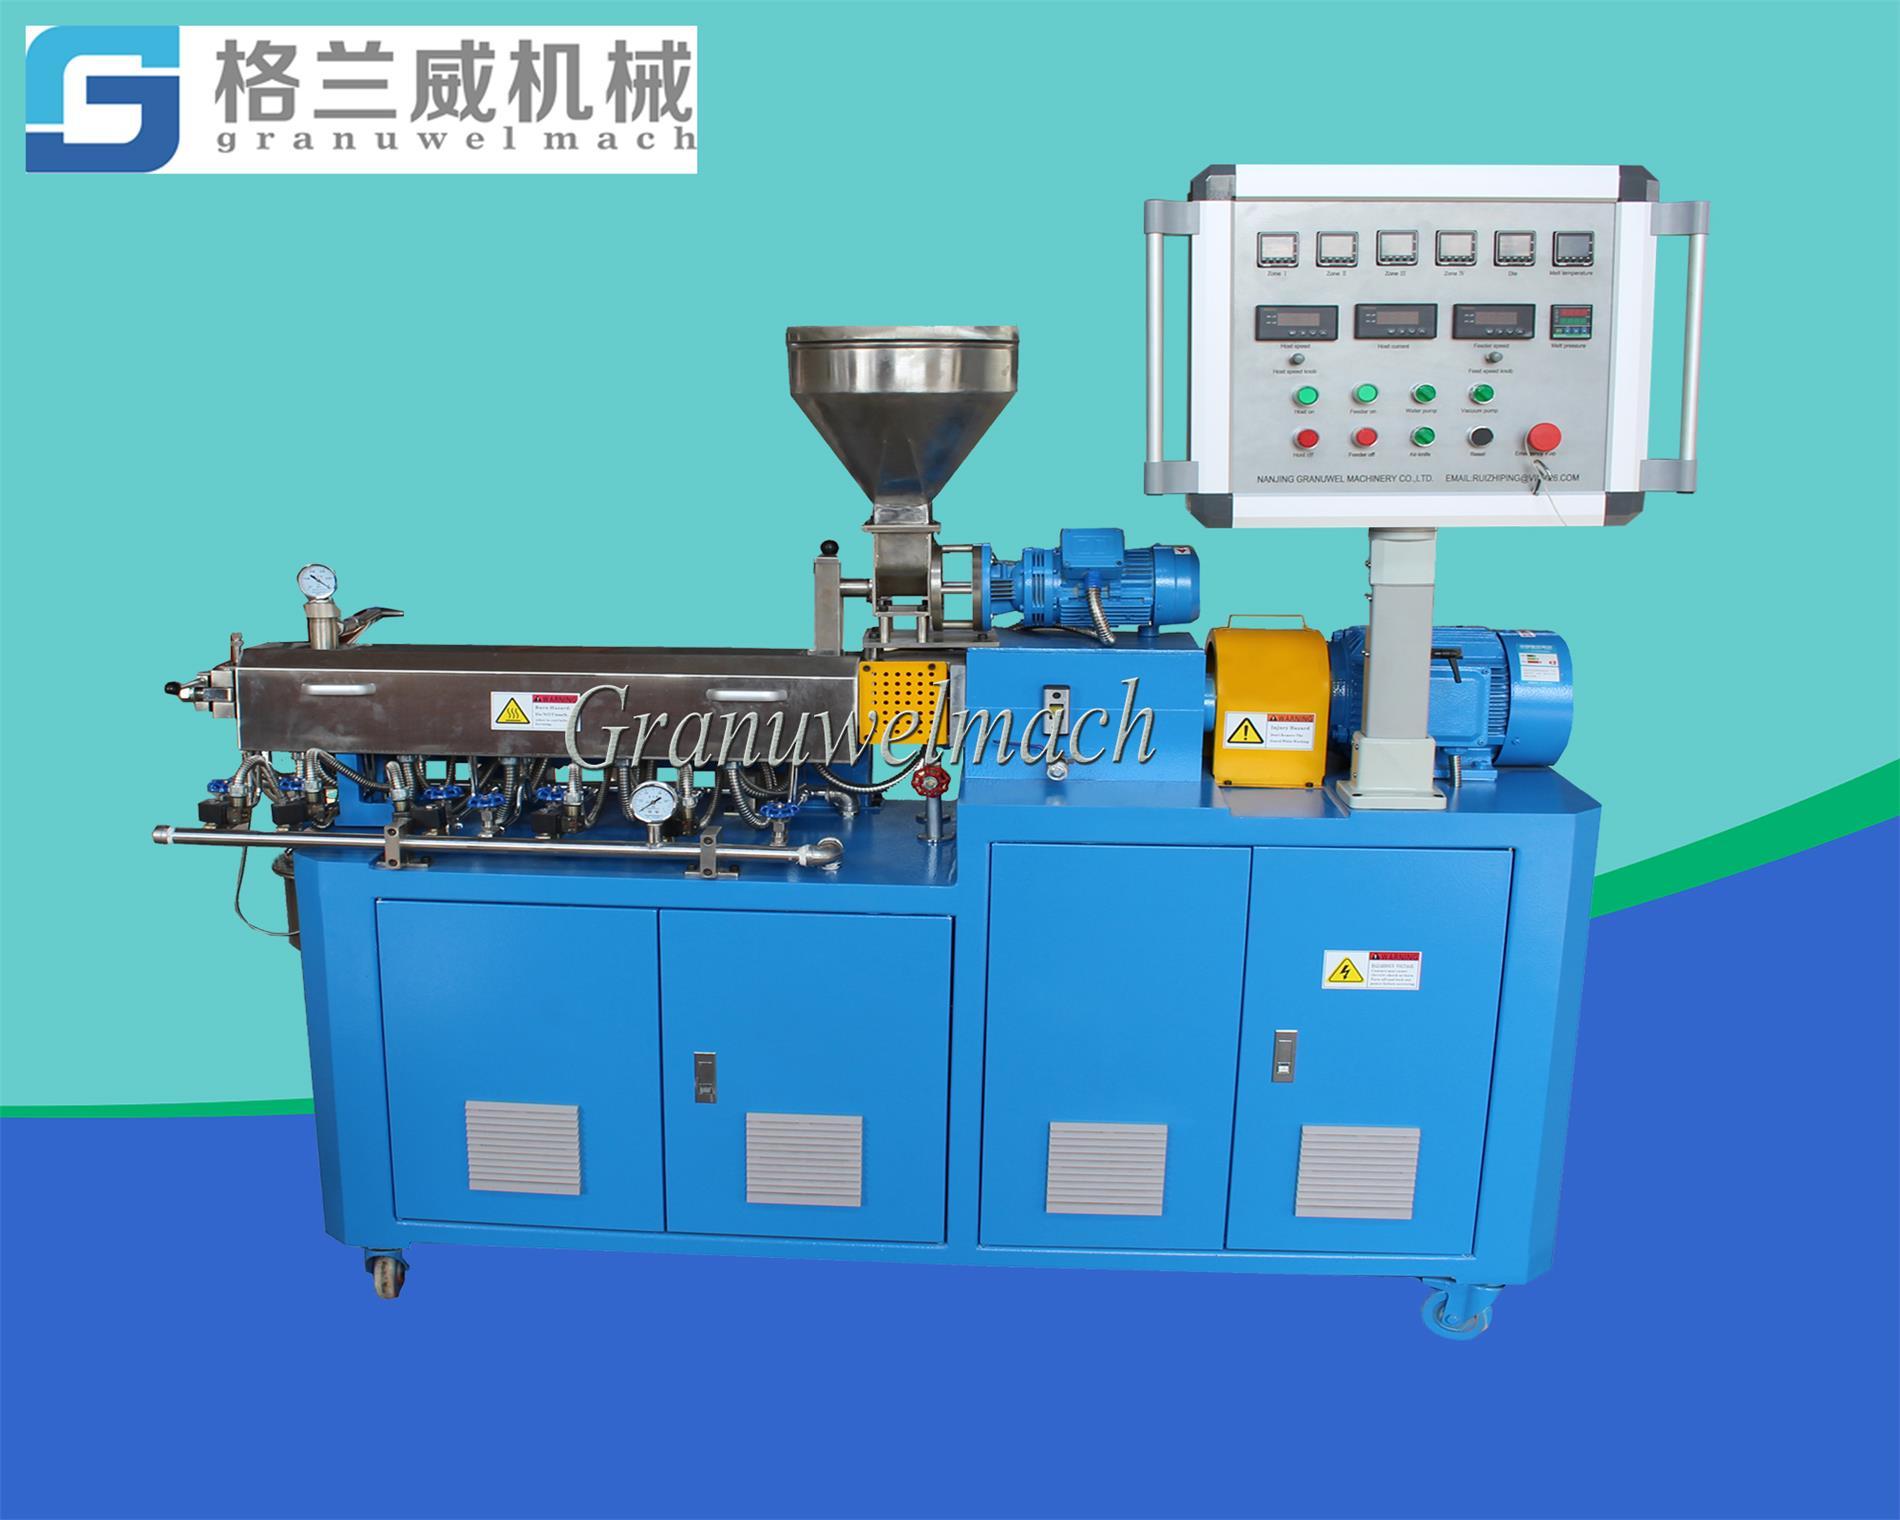 25mm plastic twin screw extruder,granulator,pelletizer for laboratory